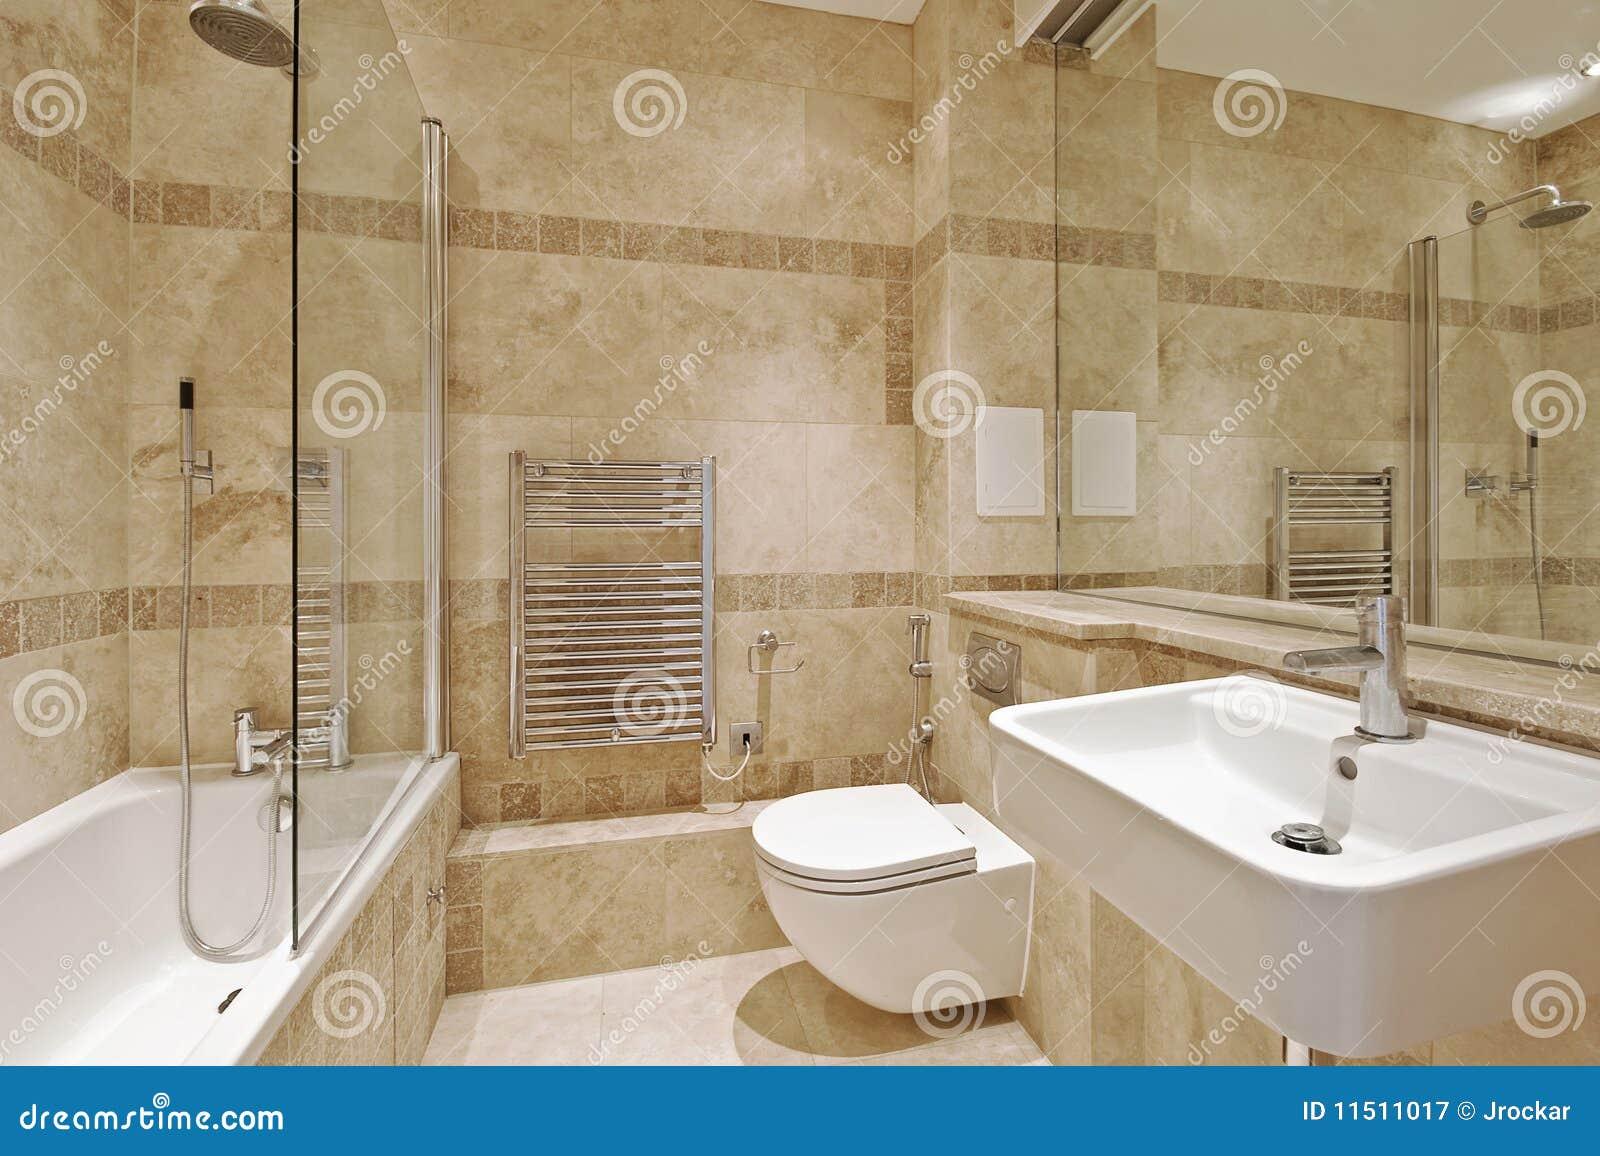 Badezimmer mit marmor lizenzfreie stockfotografie bild 11511017 - Marmor badezimmer ...